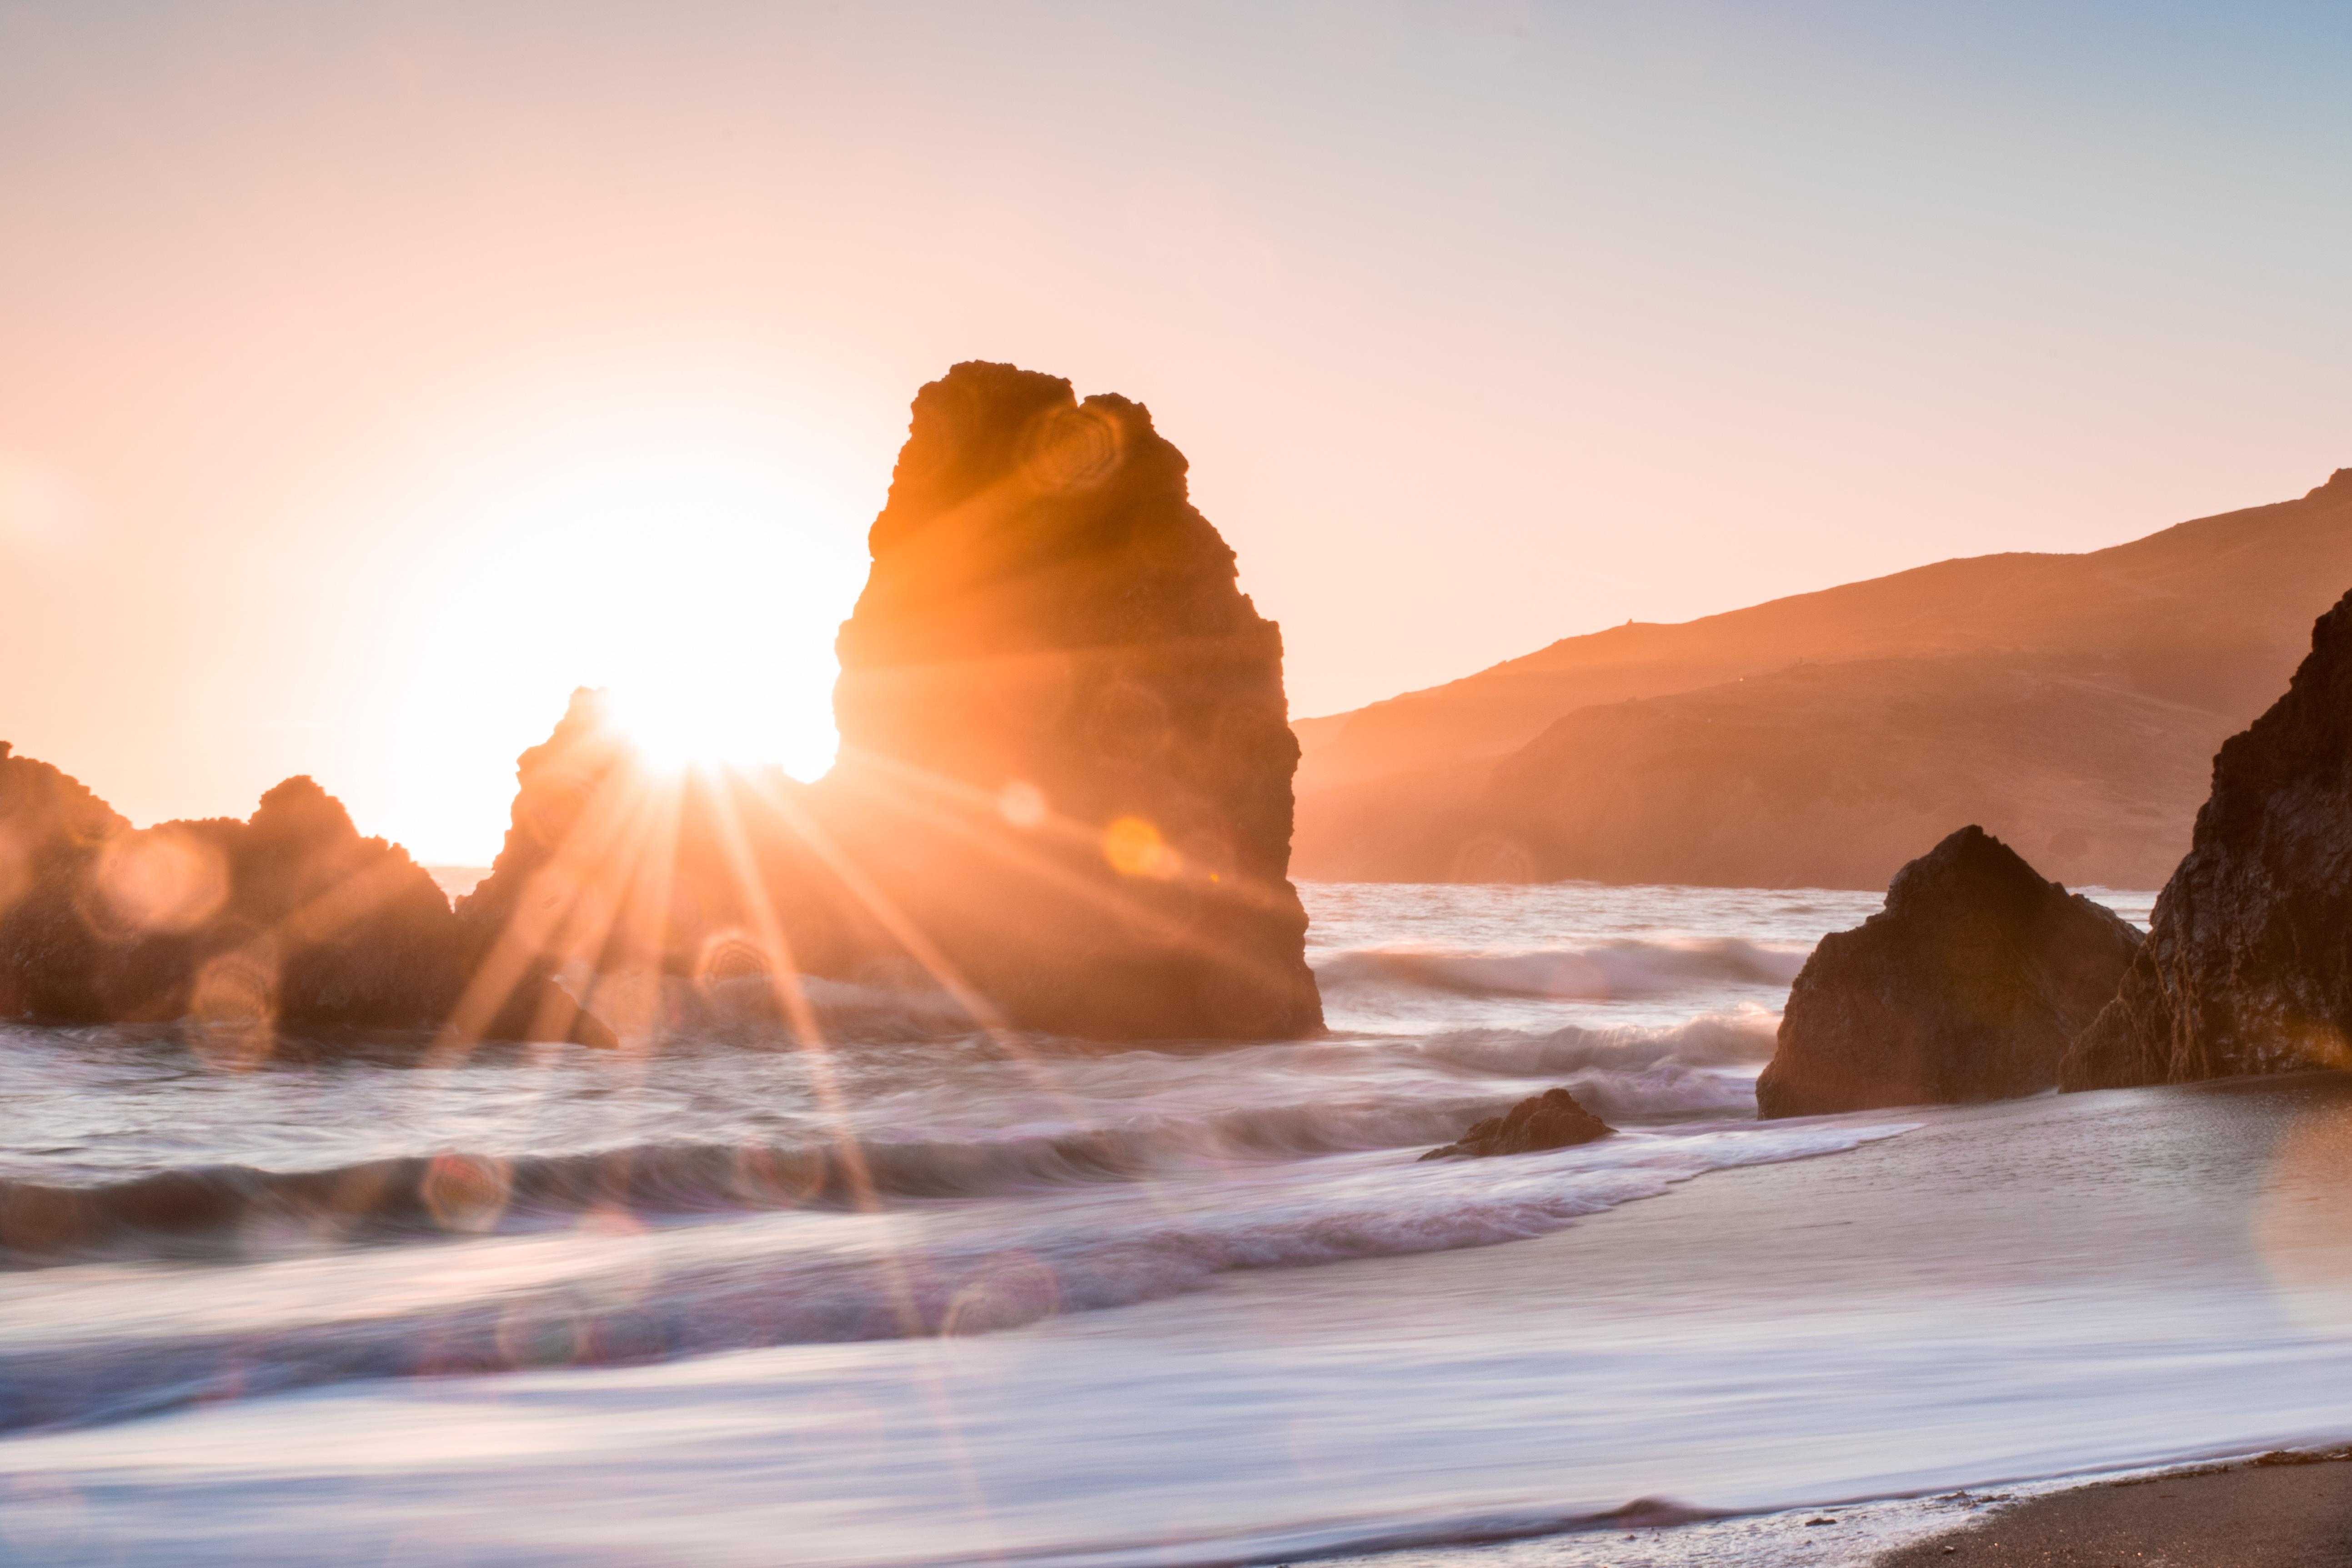 утро на берегу океана картинки нет